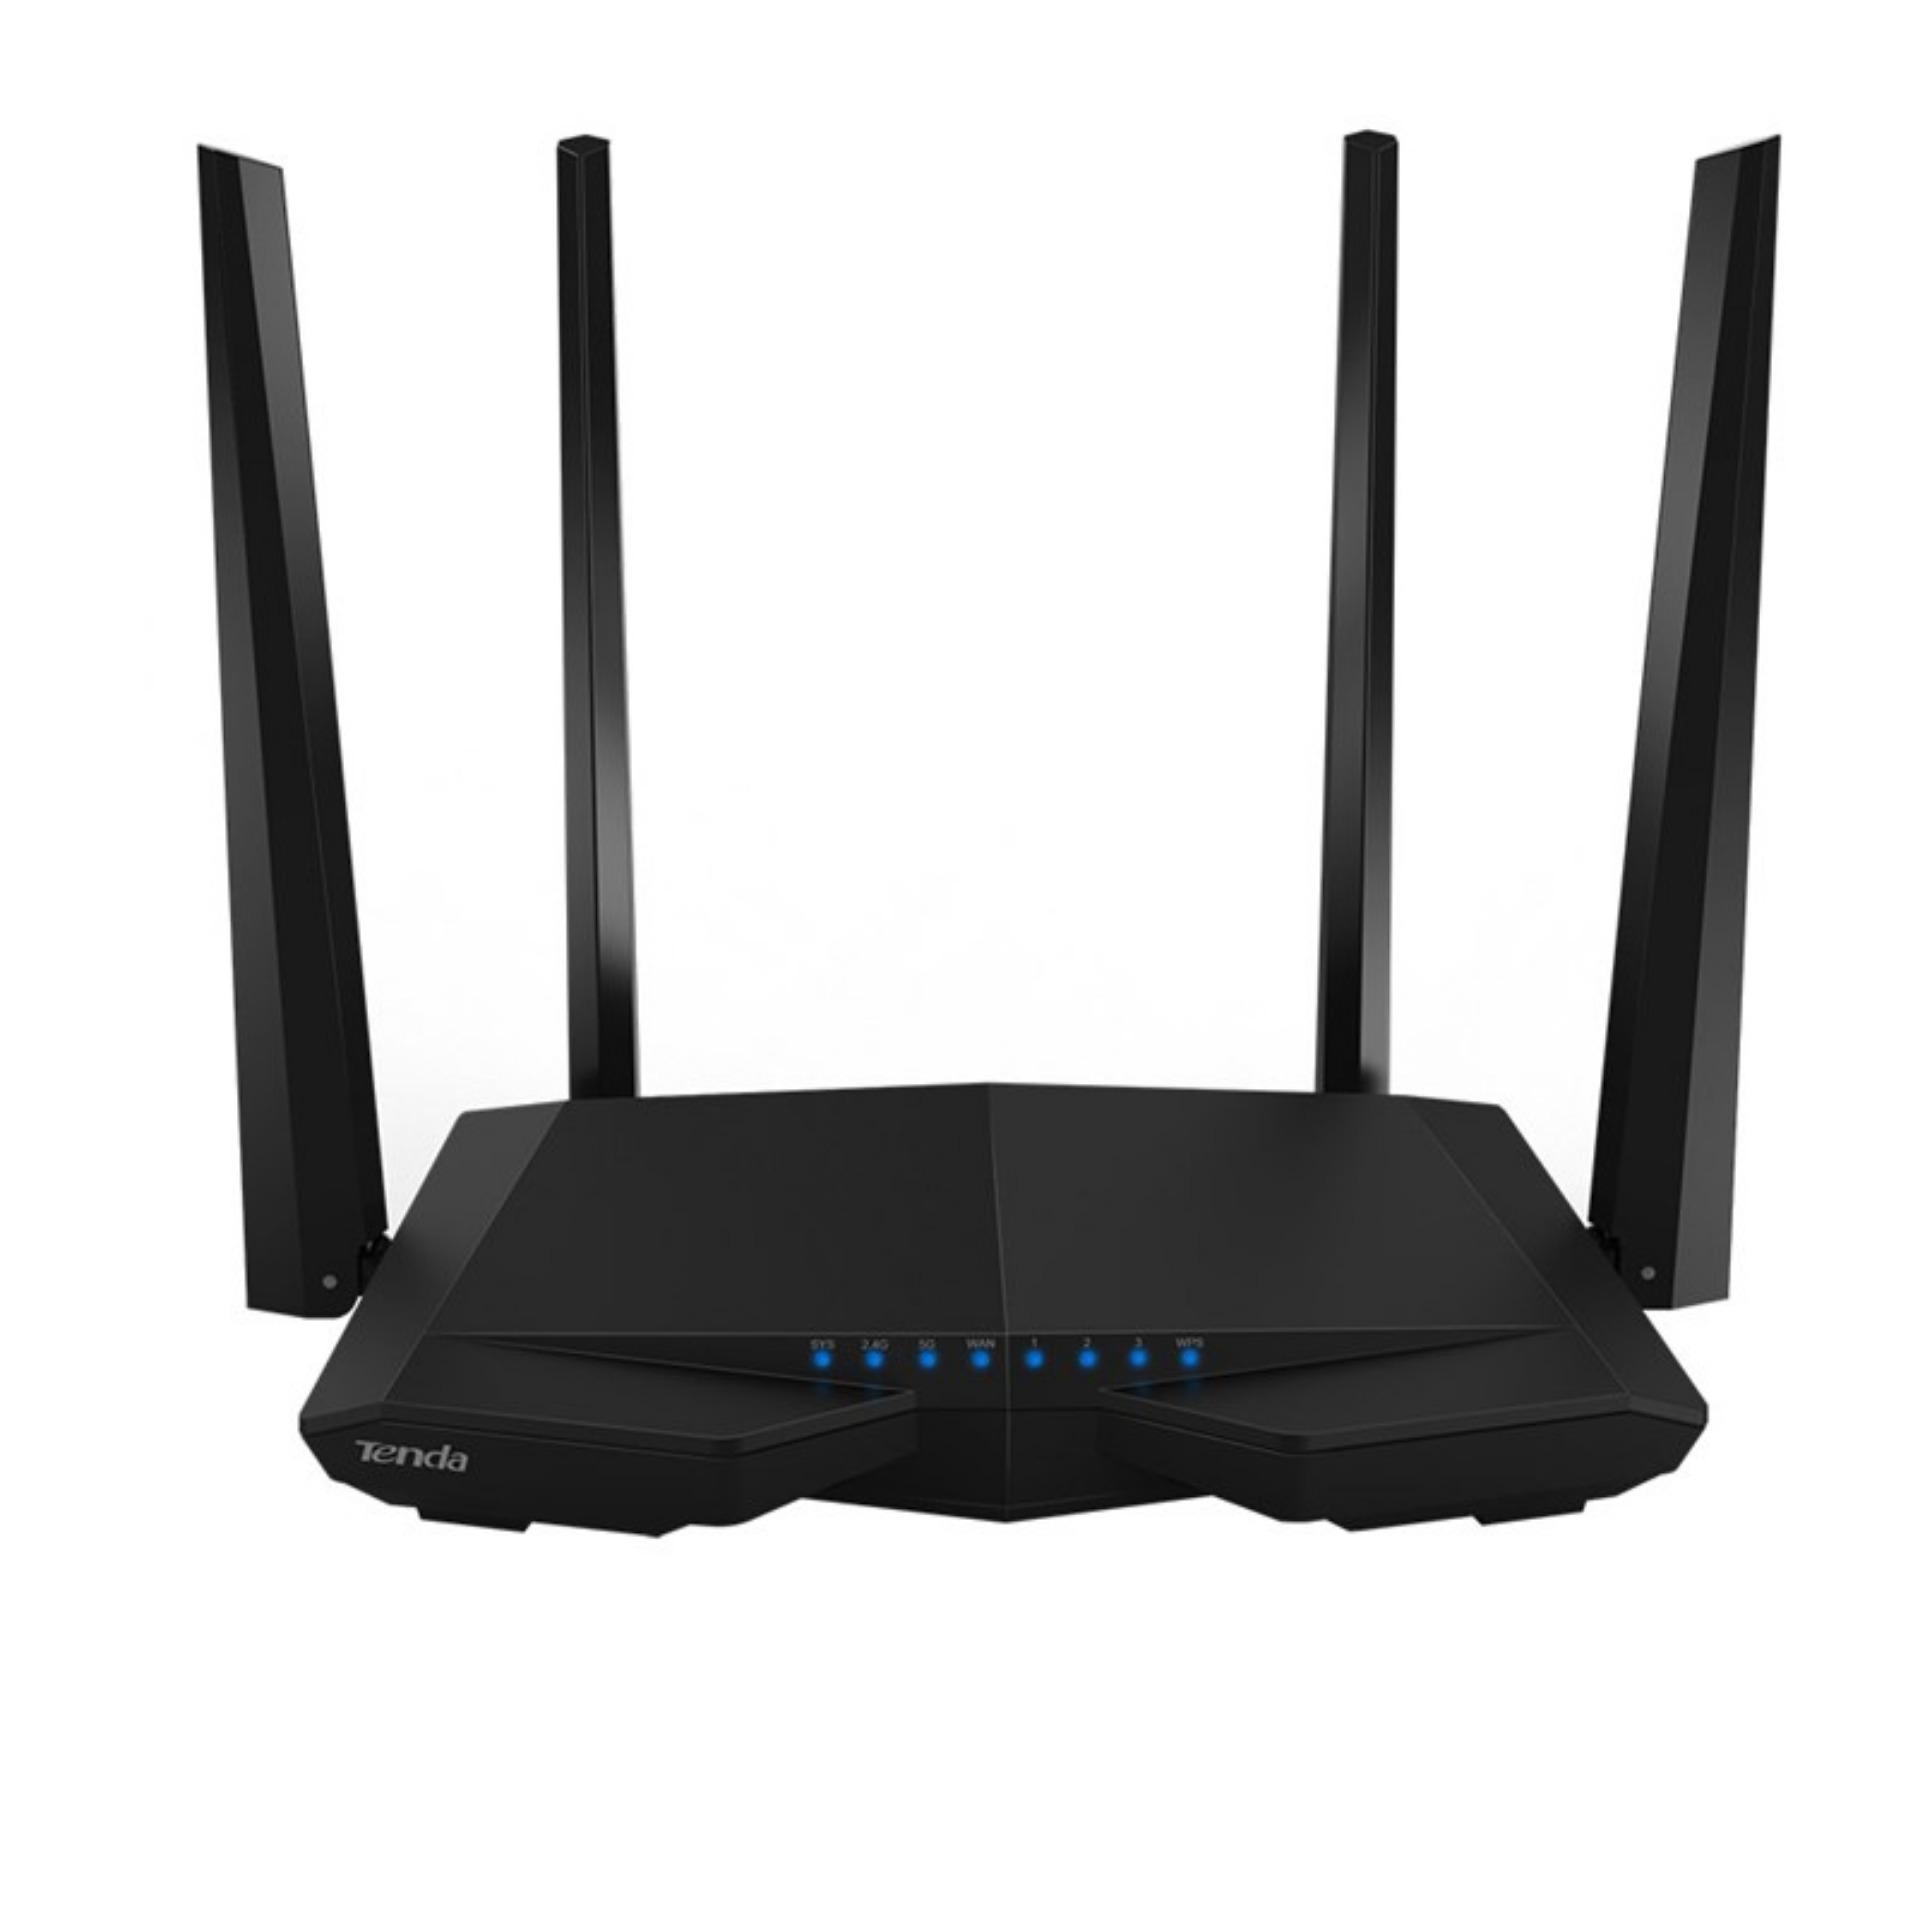 B Thu Pht Tenda Ac6 Ac1200 1200mb Smart Dual Band Gigabit Wifi Router Asus Rt Ac55uhp High Power Wireless Ac 1200 Mbps